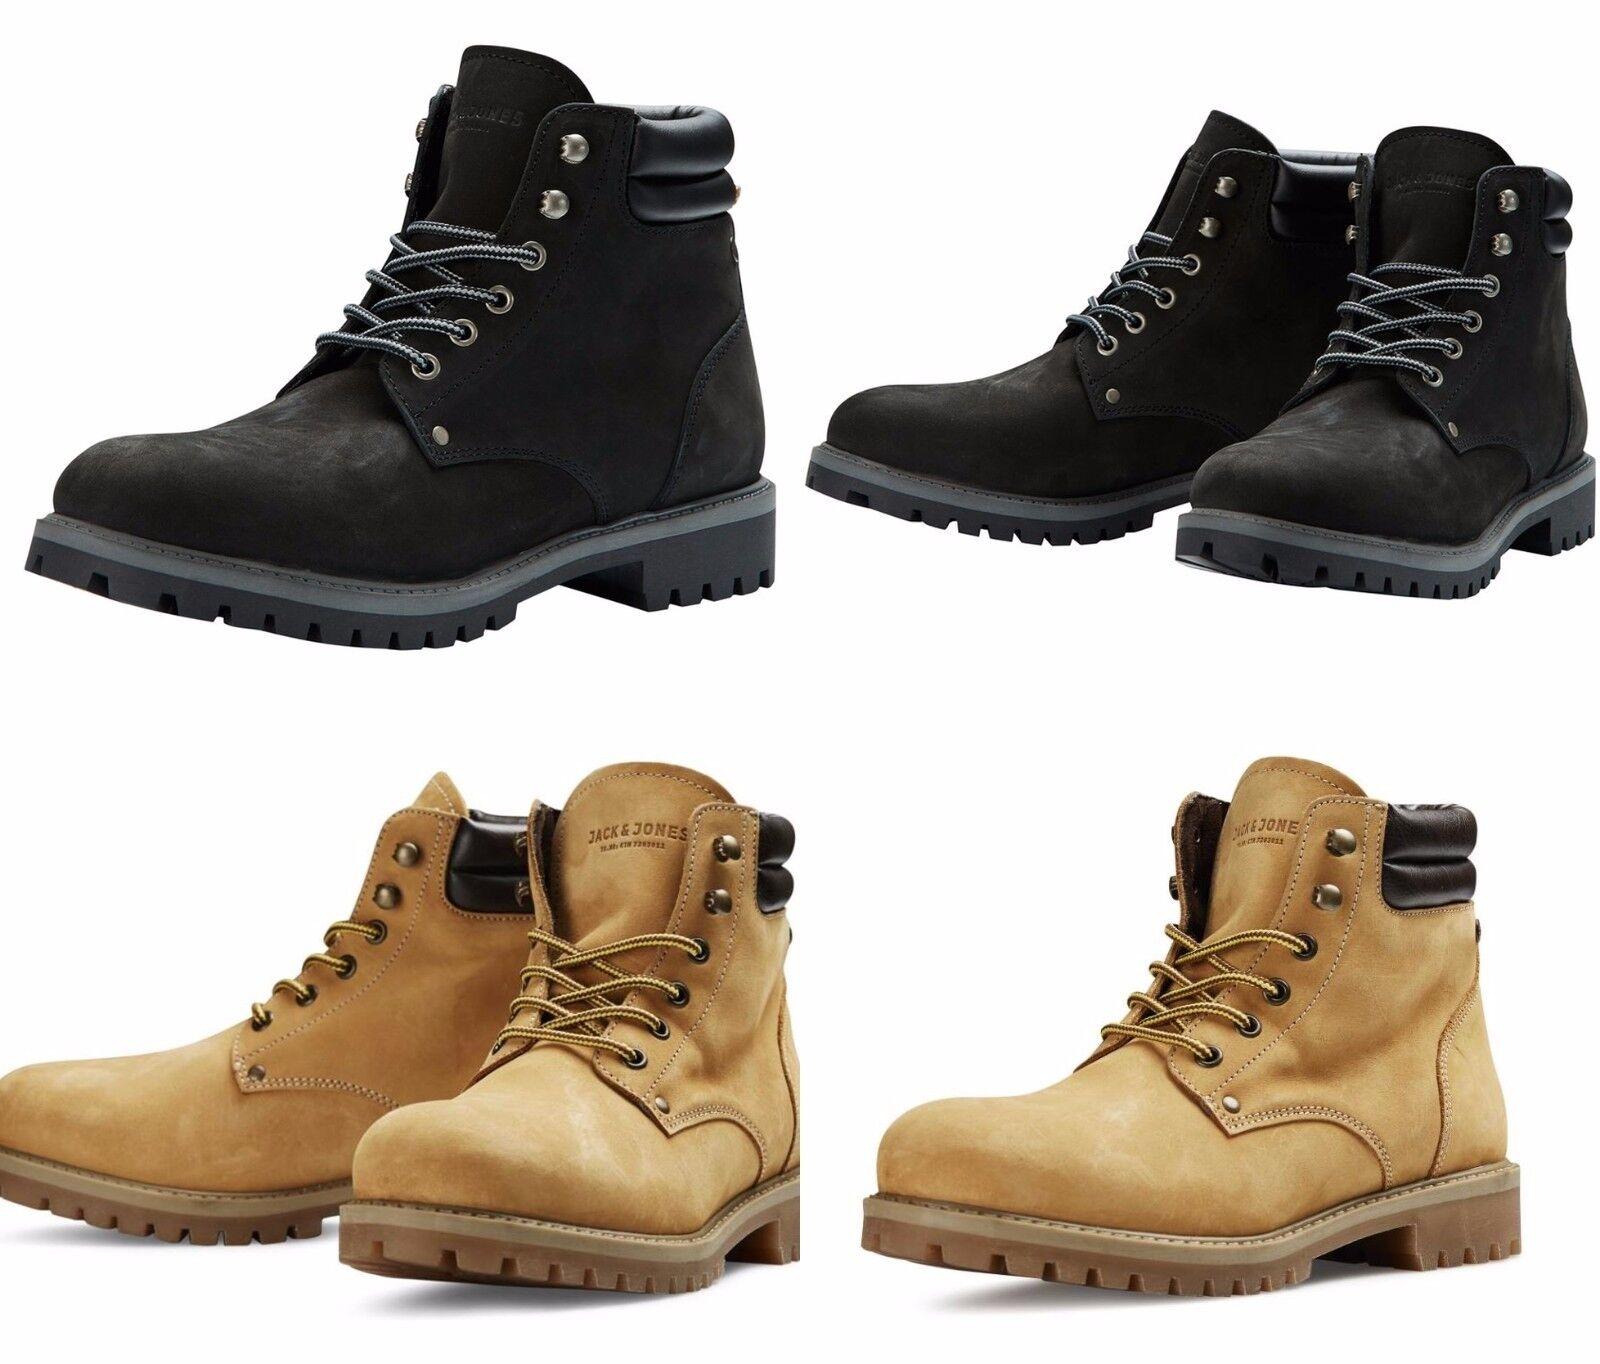 Mens JACK & JONES Leather Boots New Black Brown Lace Ups Nubuck Sale Size 7-12